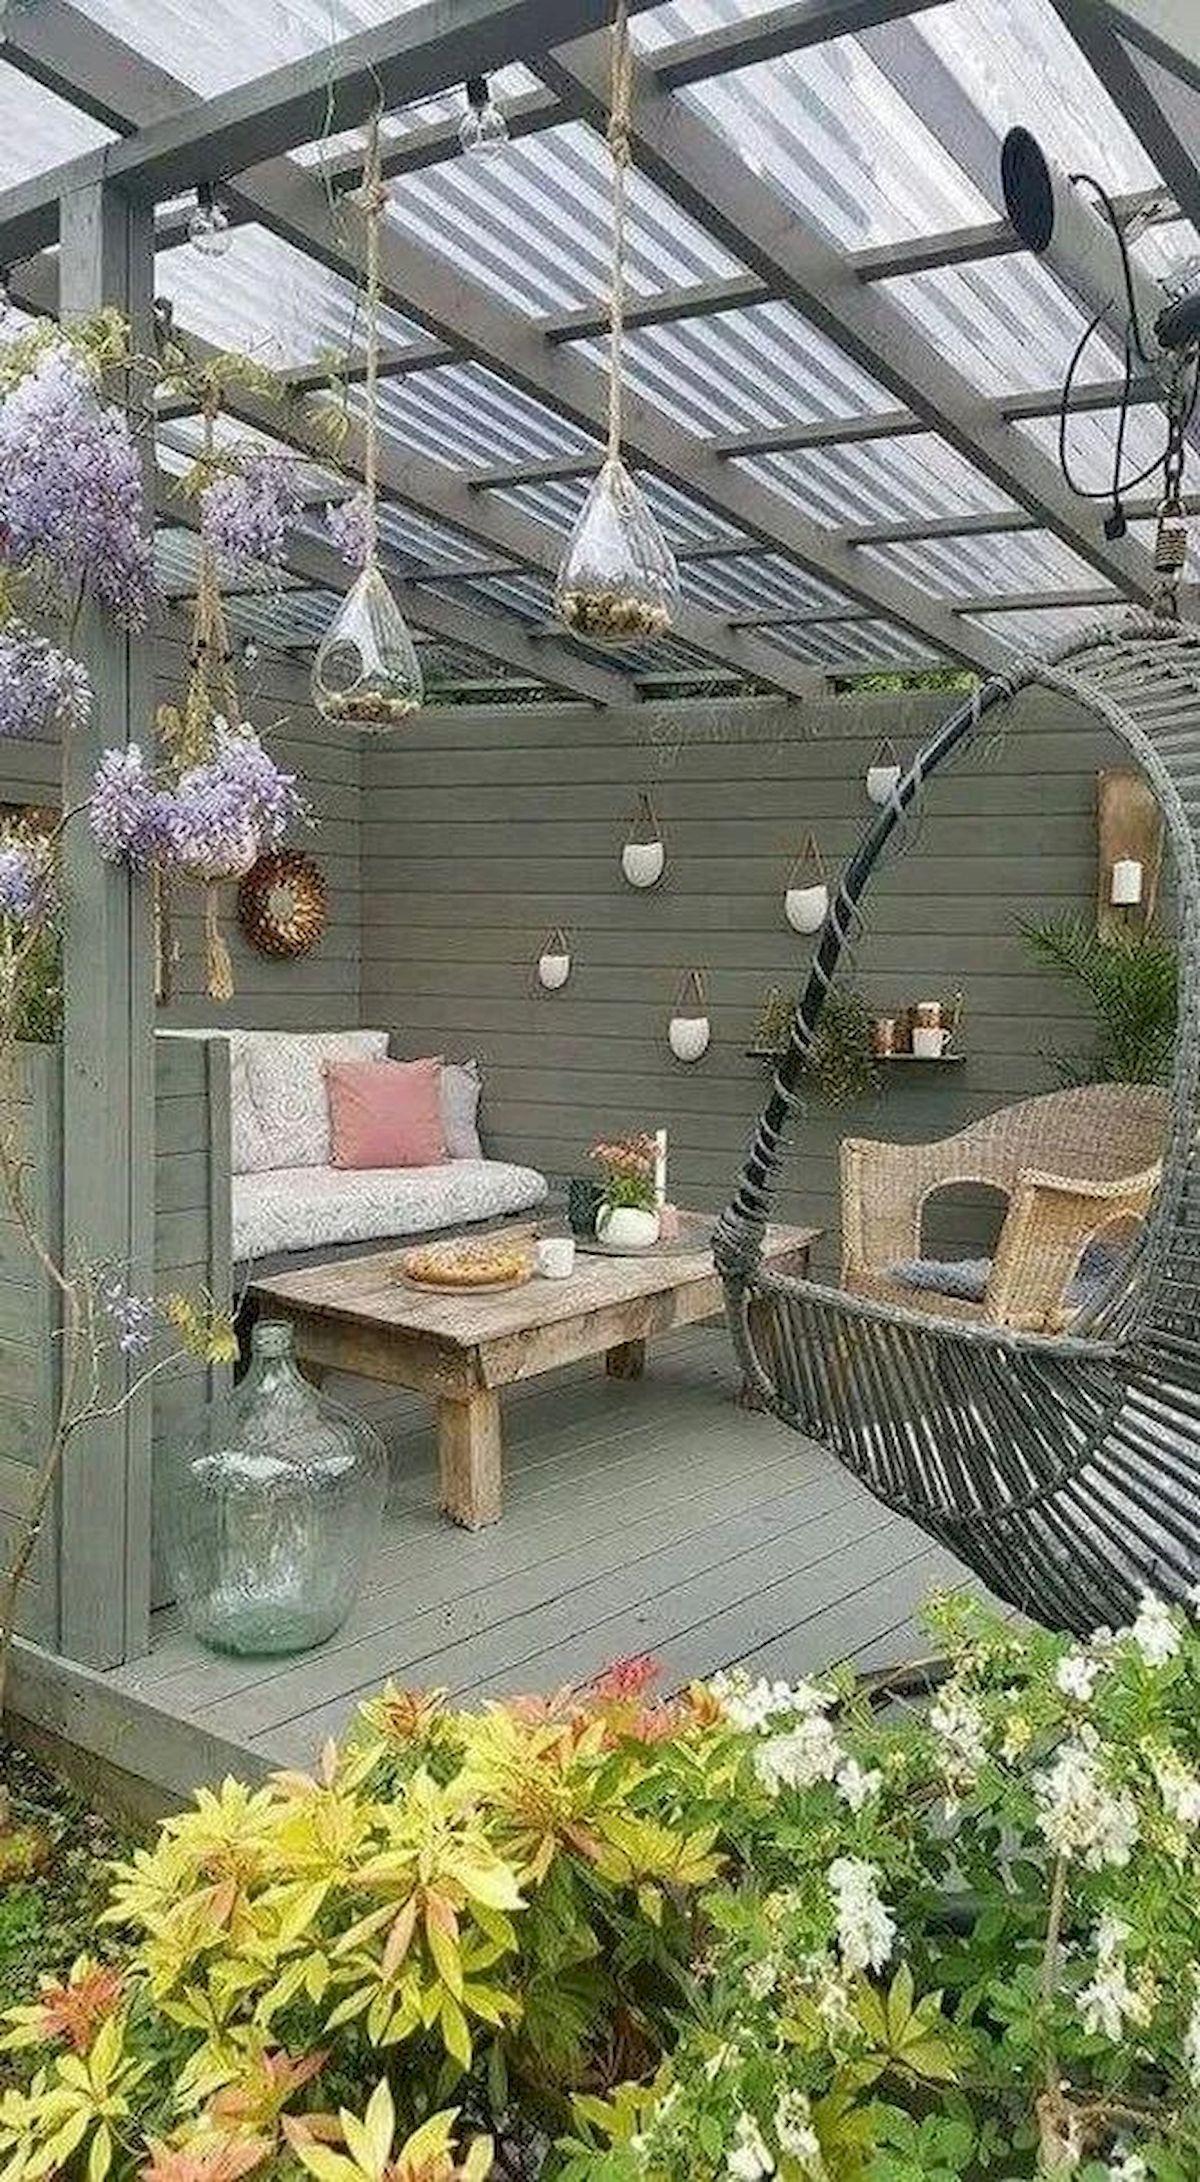 50 Awesome DIY Hanging Plants Ideas For Modern Backyard Garden (3)